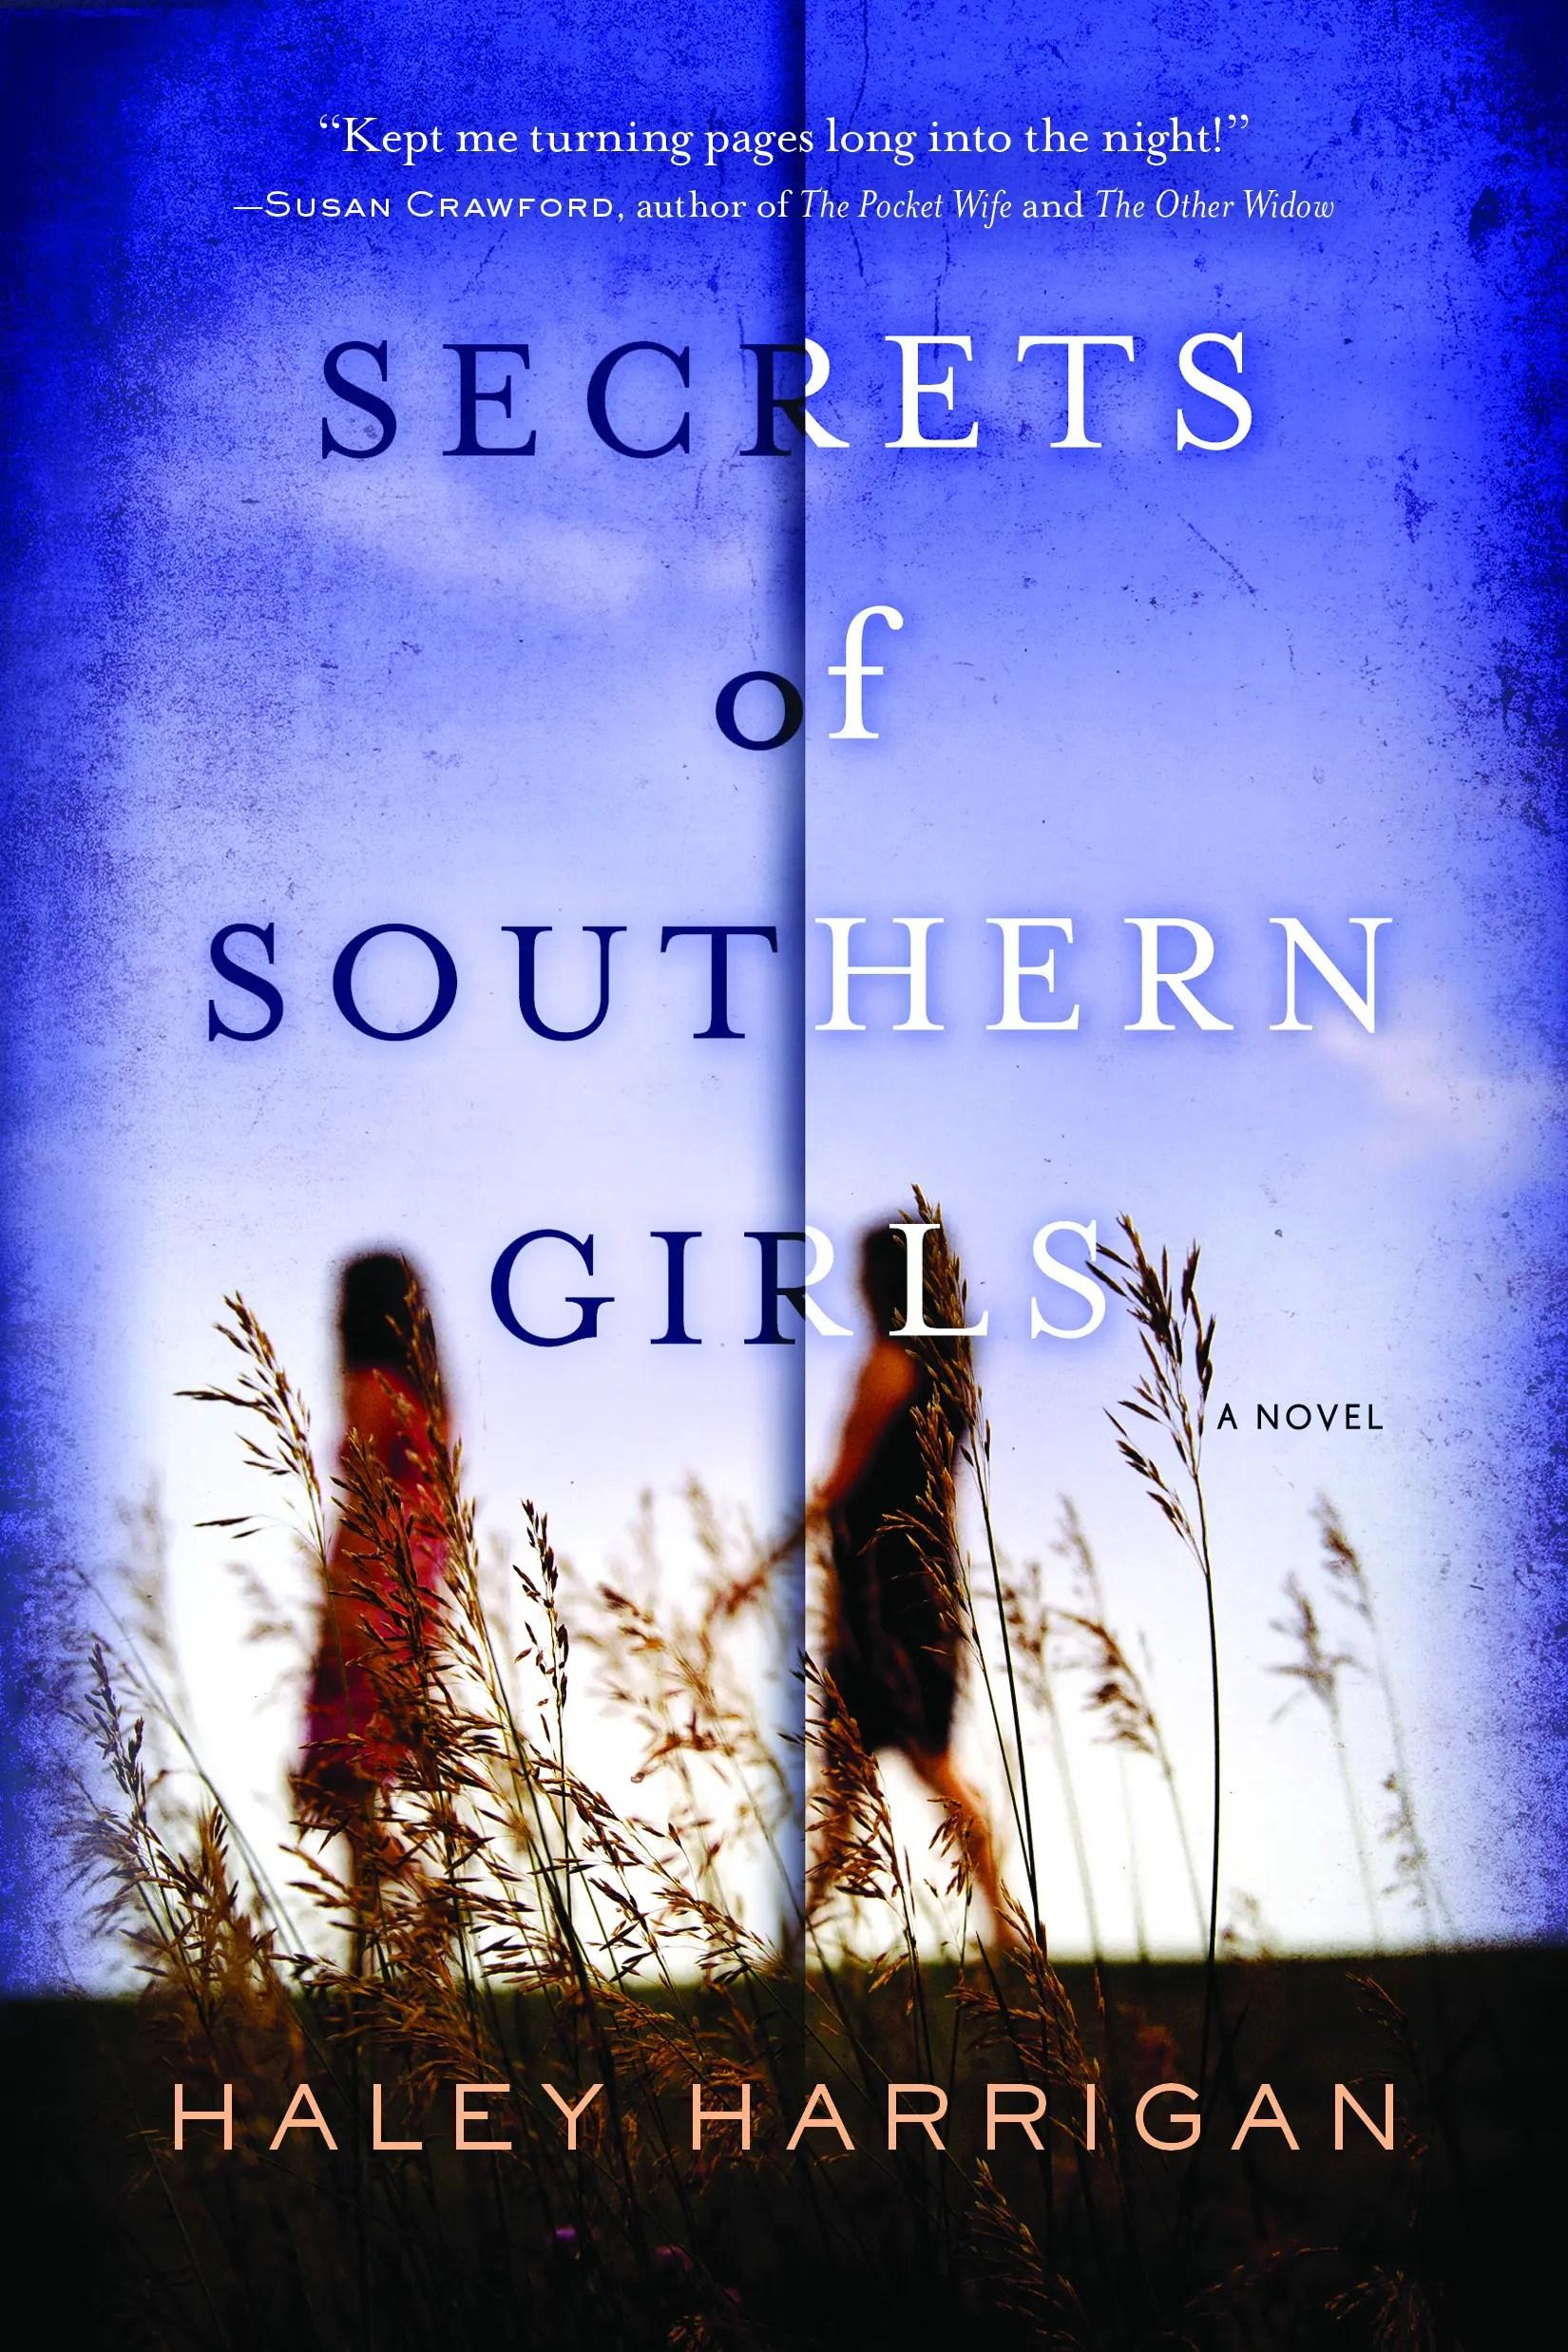 Secrets of Southern Girls | leahdecesare.com